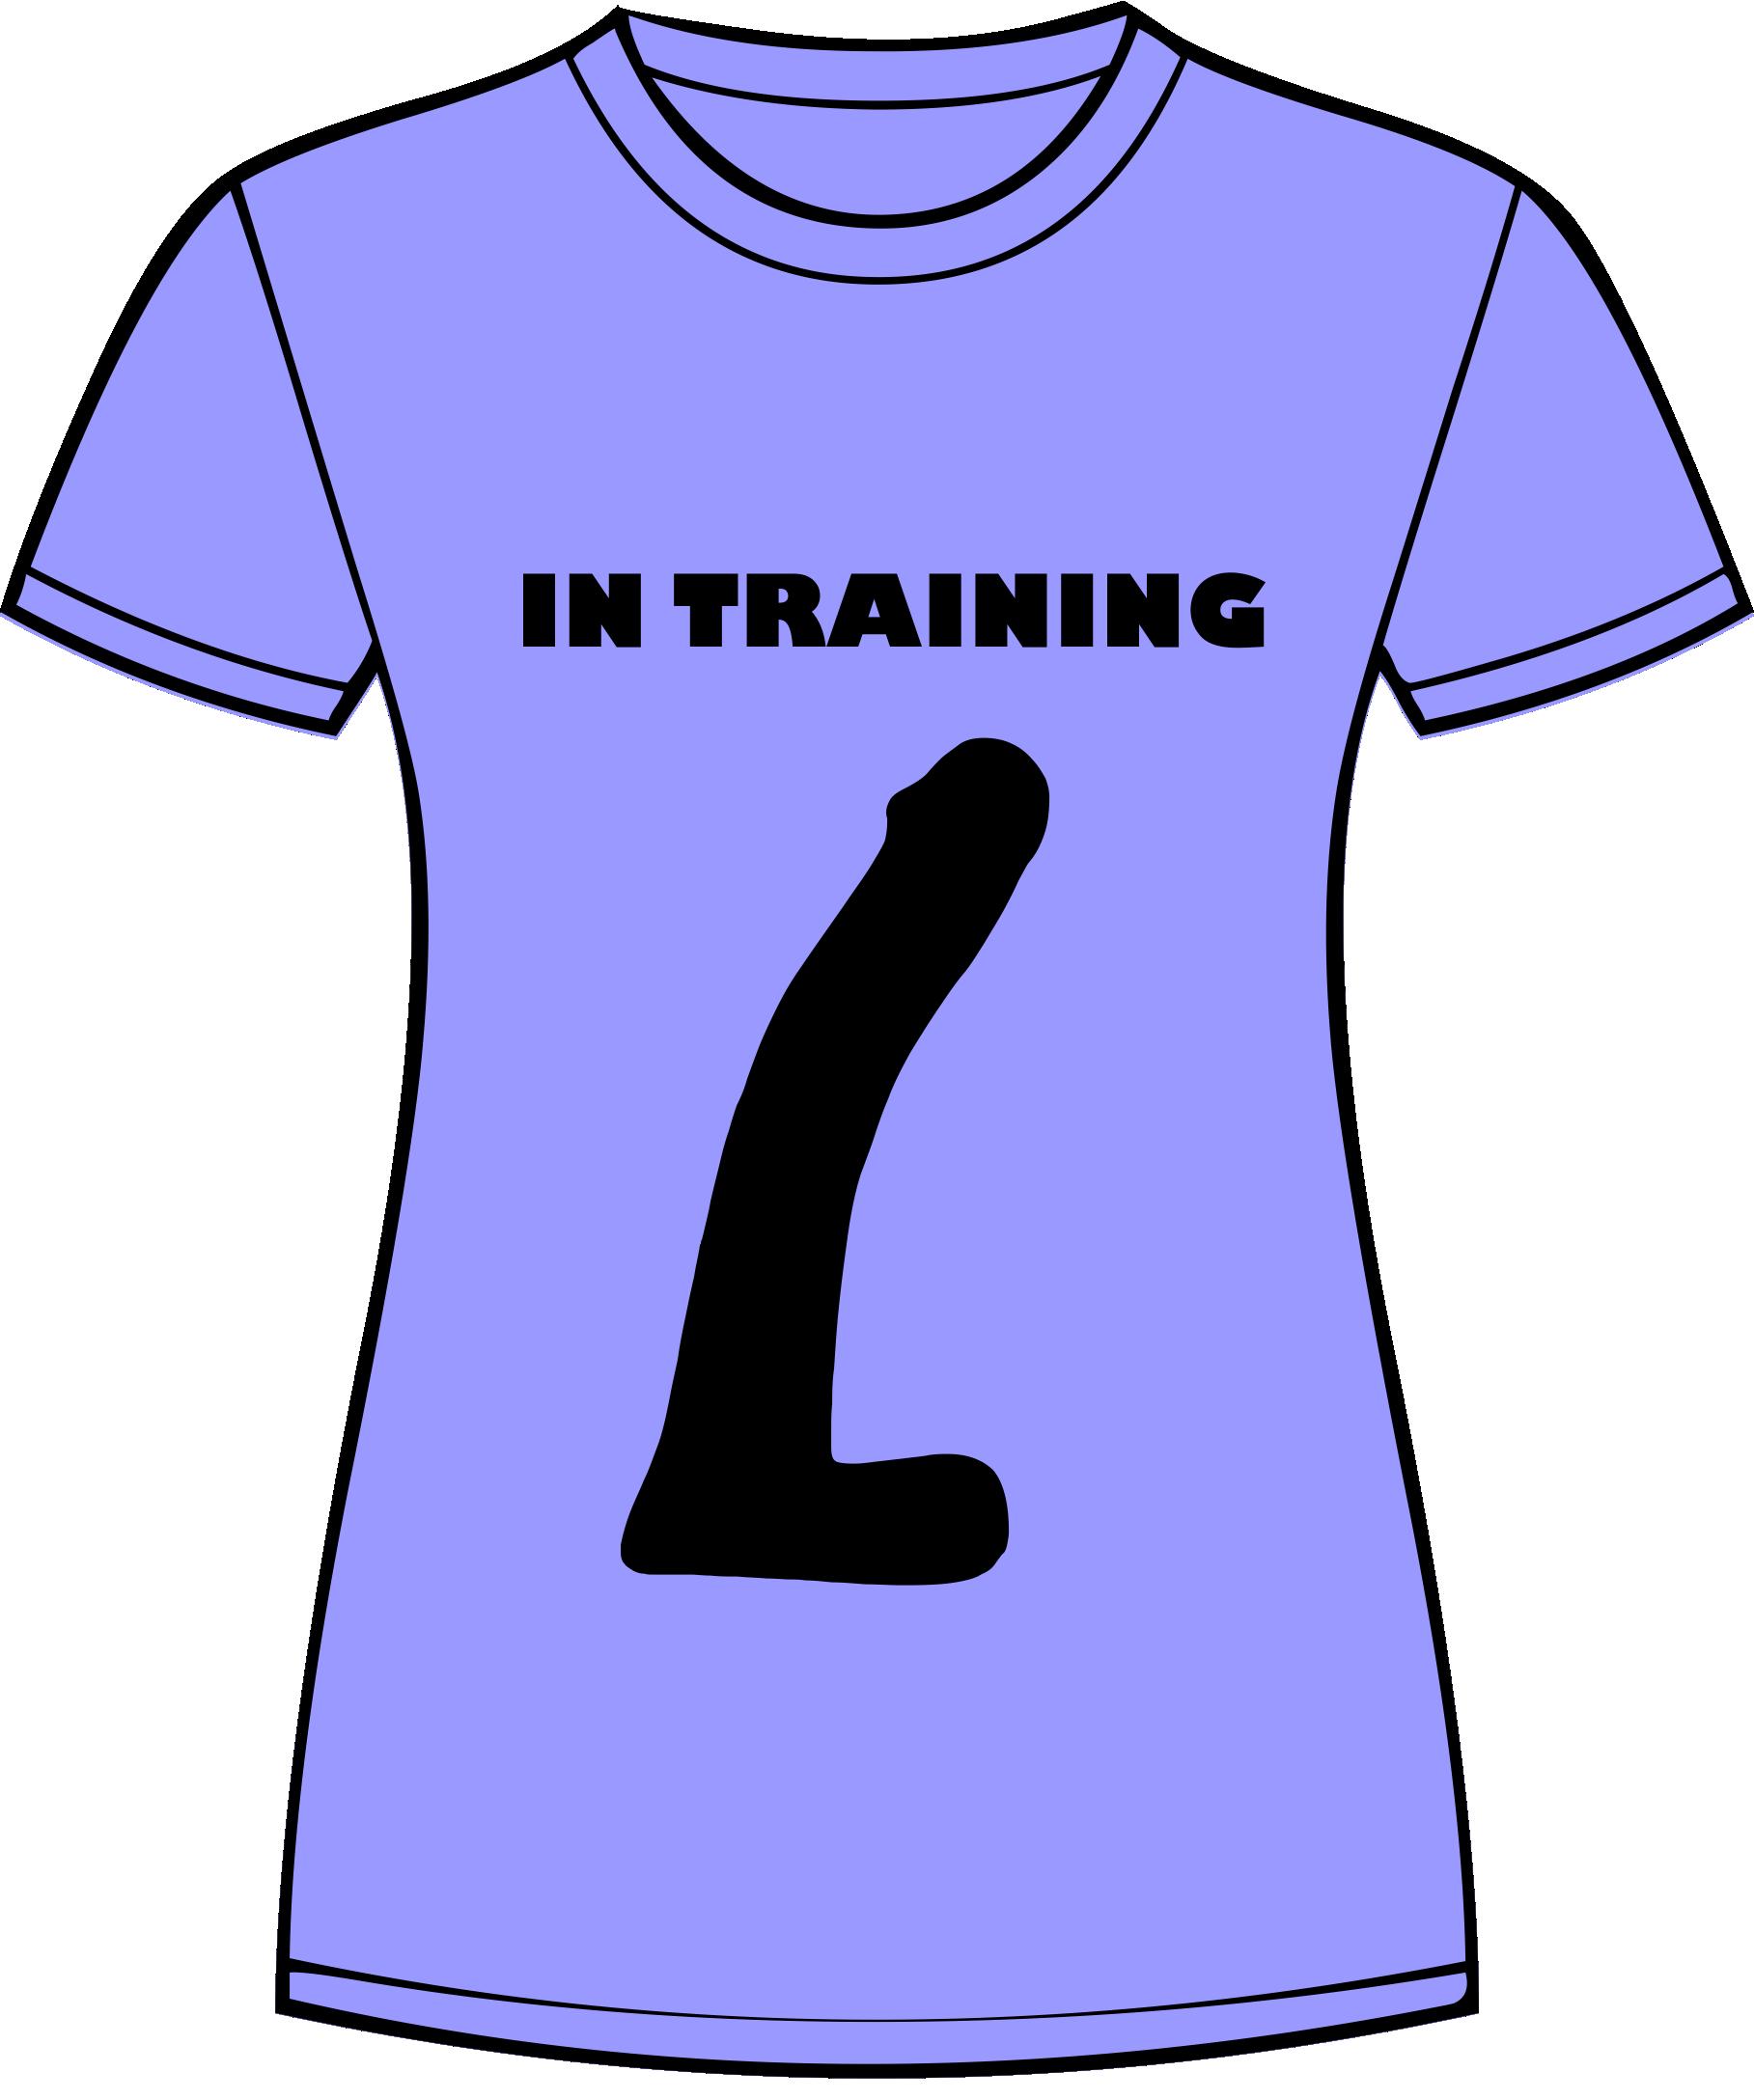 In Training Tshirt